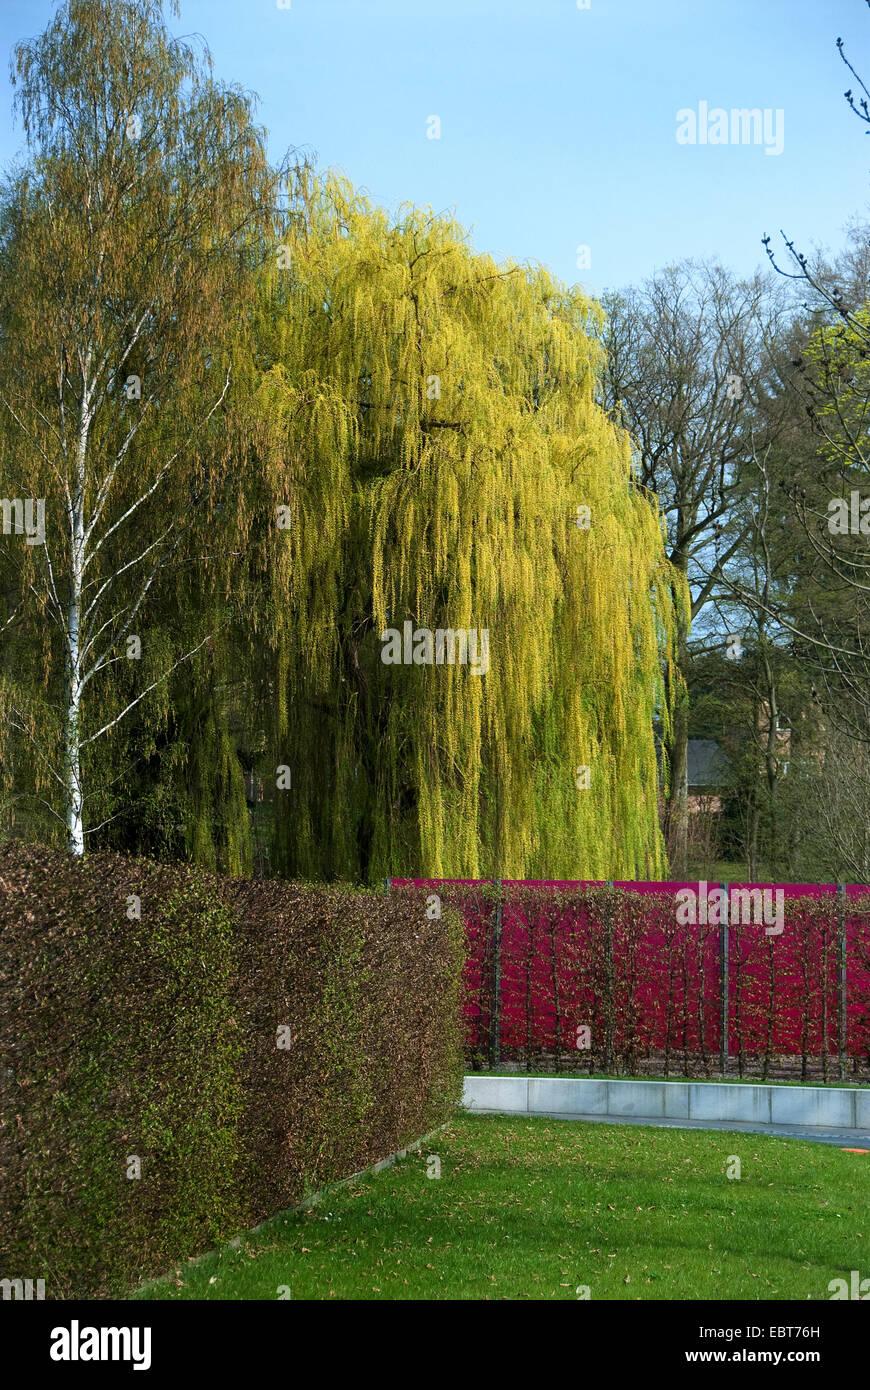 dwarf gray willow (Salix alba 'Tristis', Salix alba Tristis), cultivar Tristis in a park in autumn - Stock Image